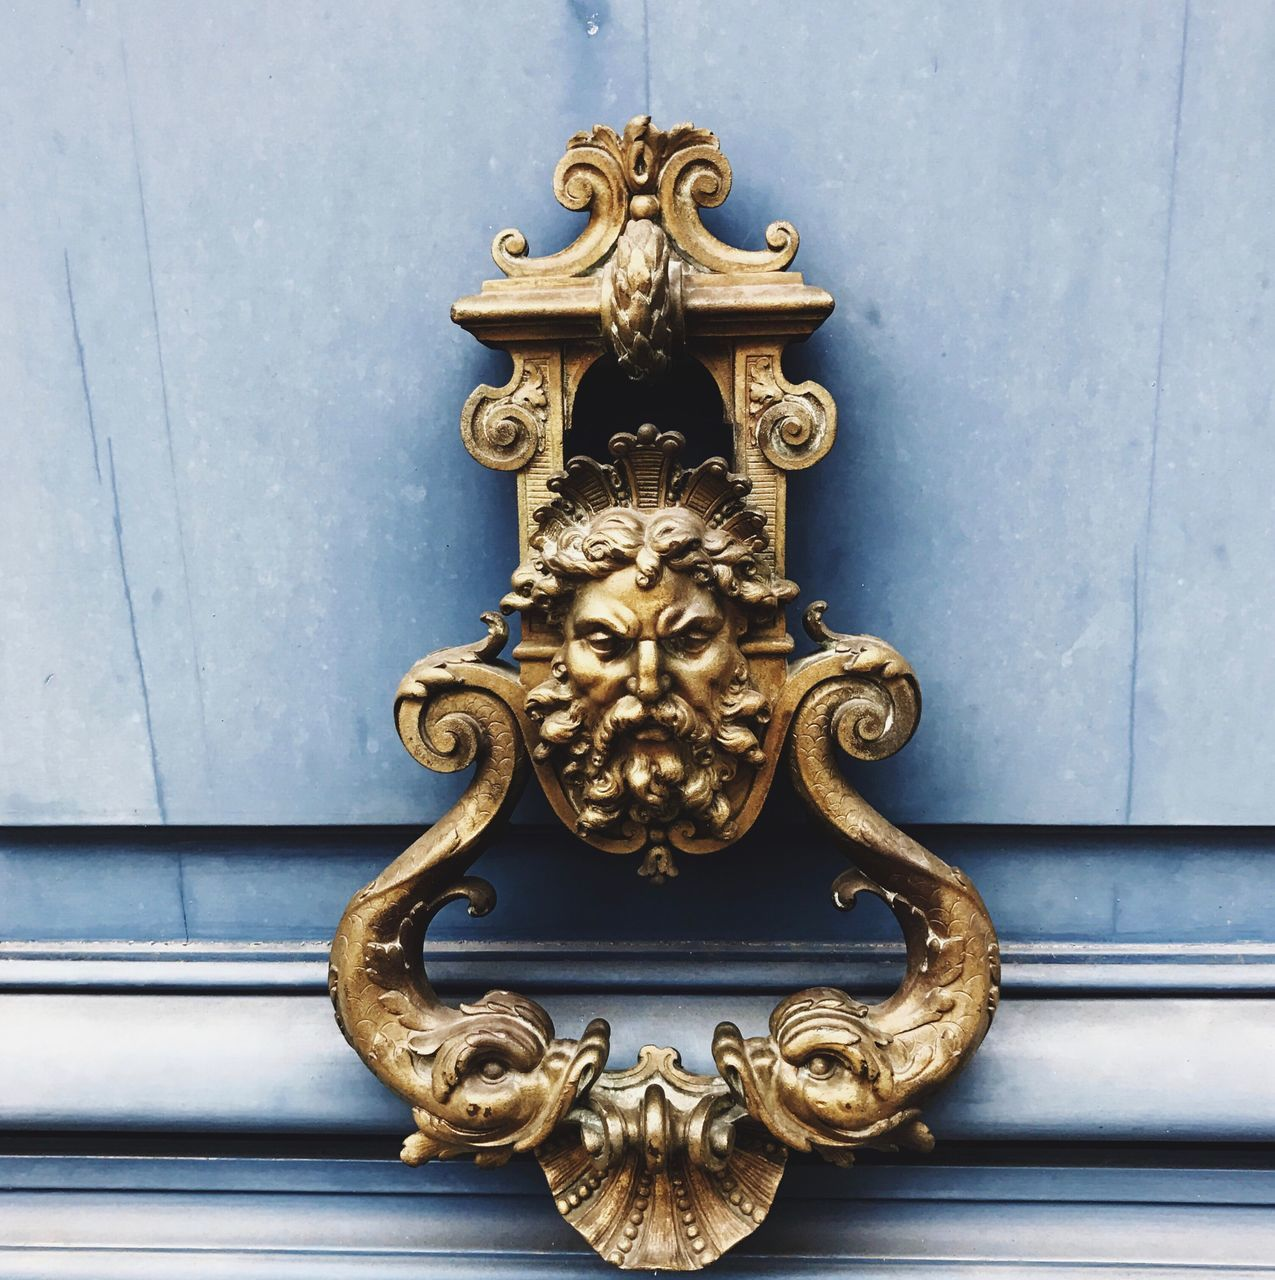 metal, door, close-up, door knocker, outdoors, design, day, no people, full frame, gold colored, building exterior